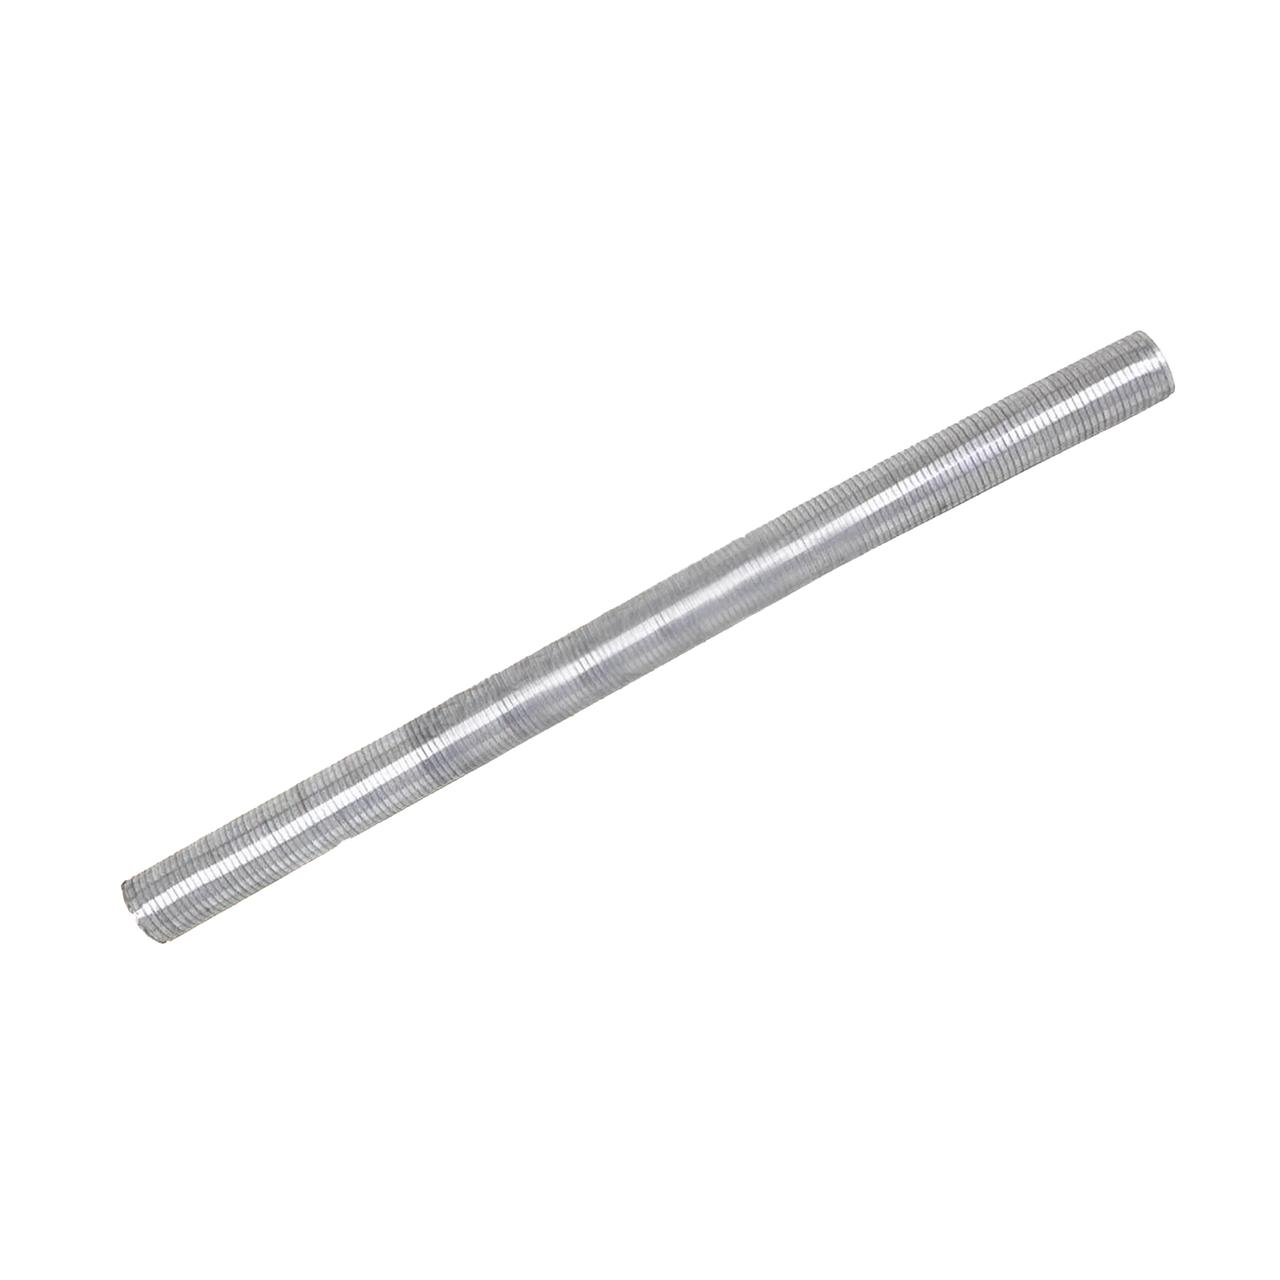 Гофрированная труба оцинкованная сталь 80 мм 0,5м без фланцев